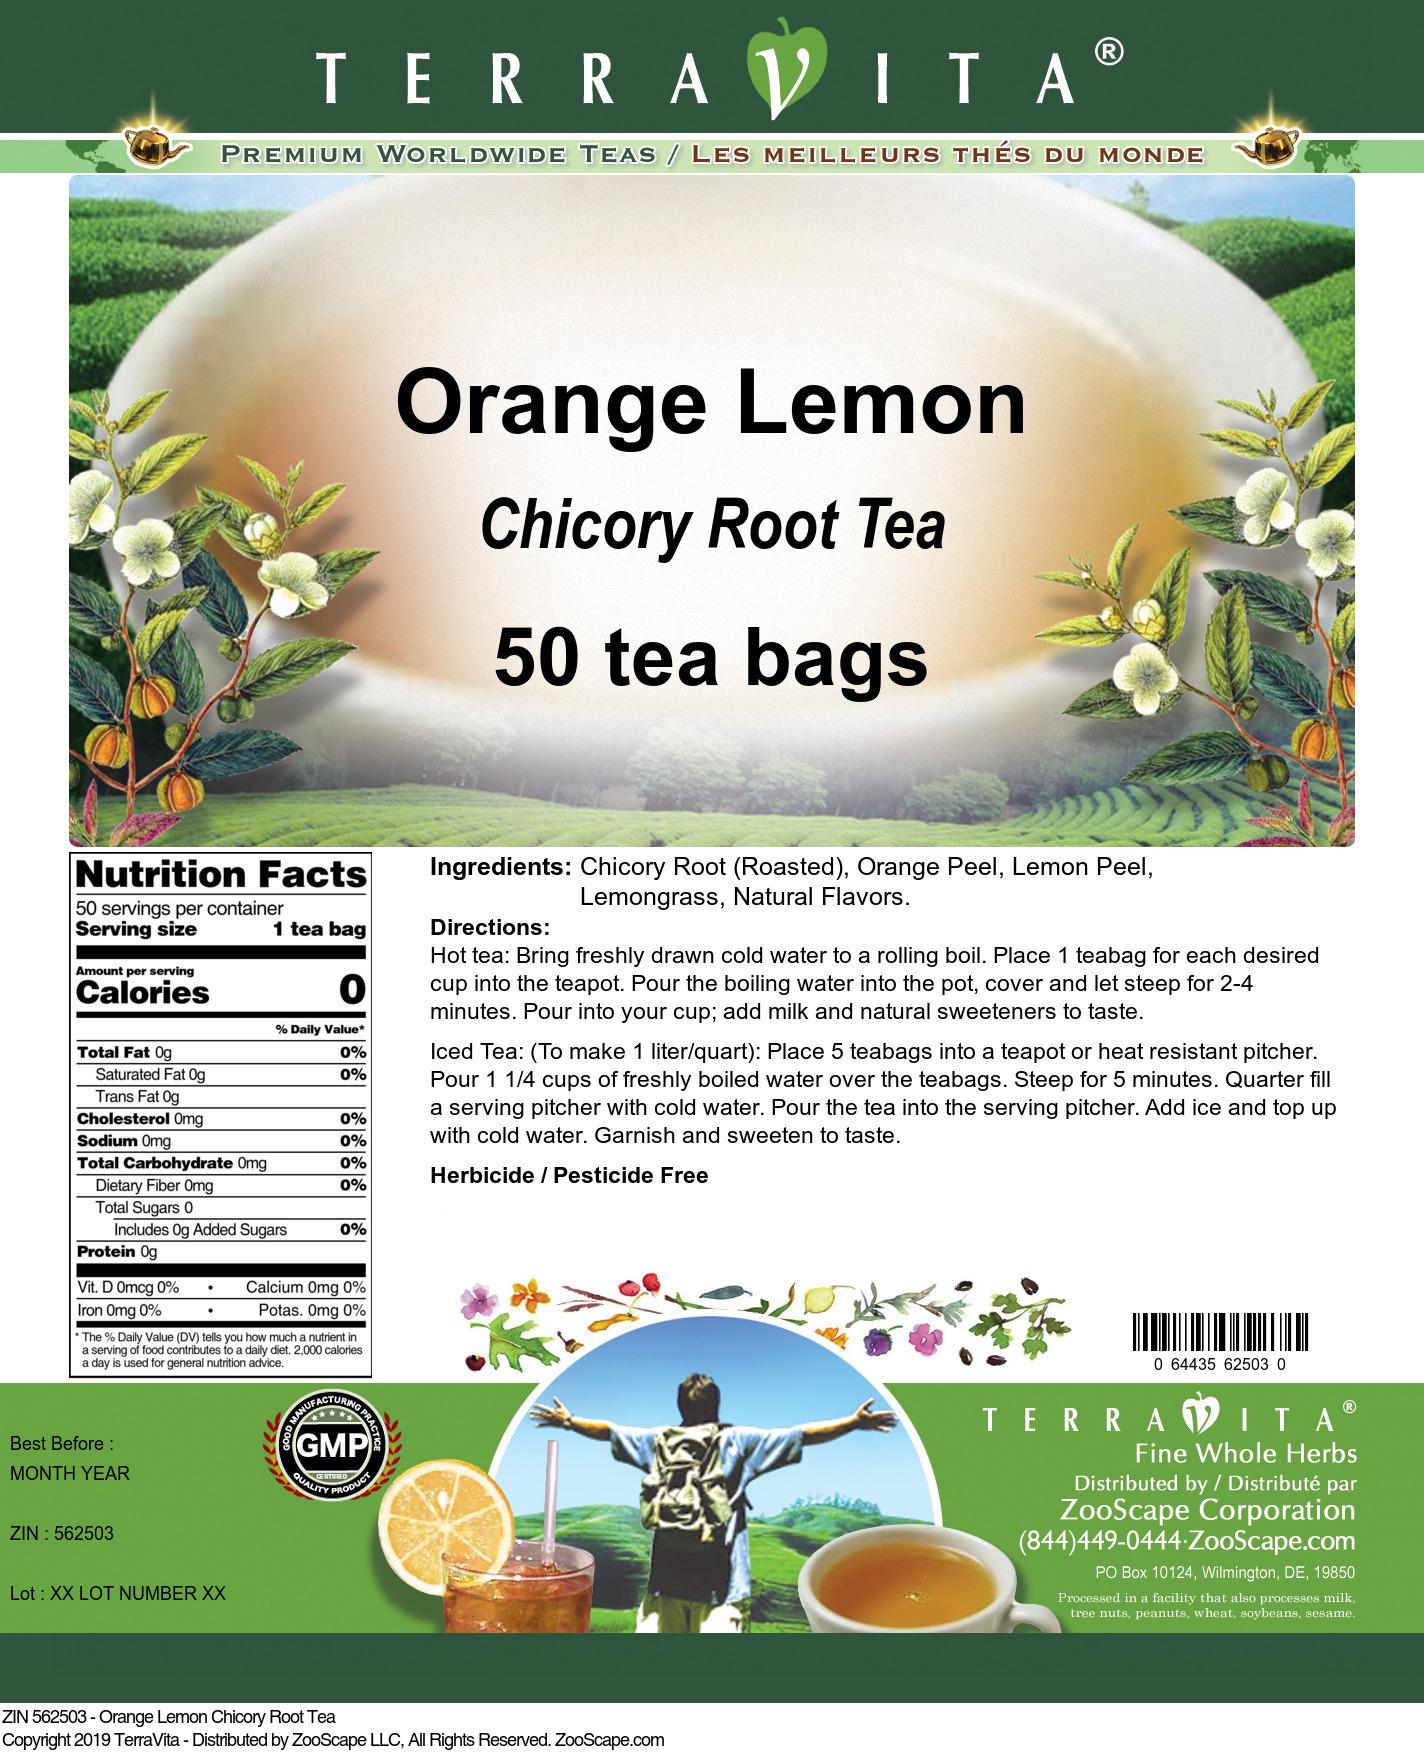 Orange Lemon Chicory Root Tea